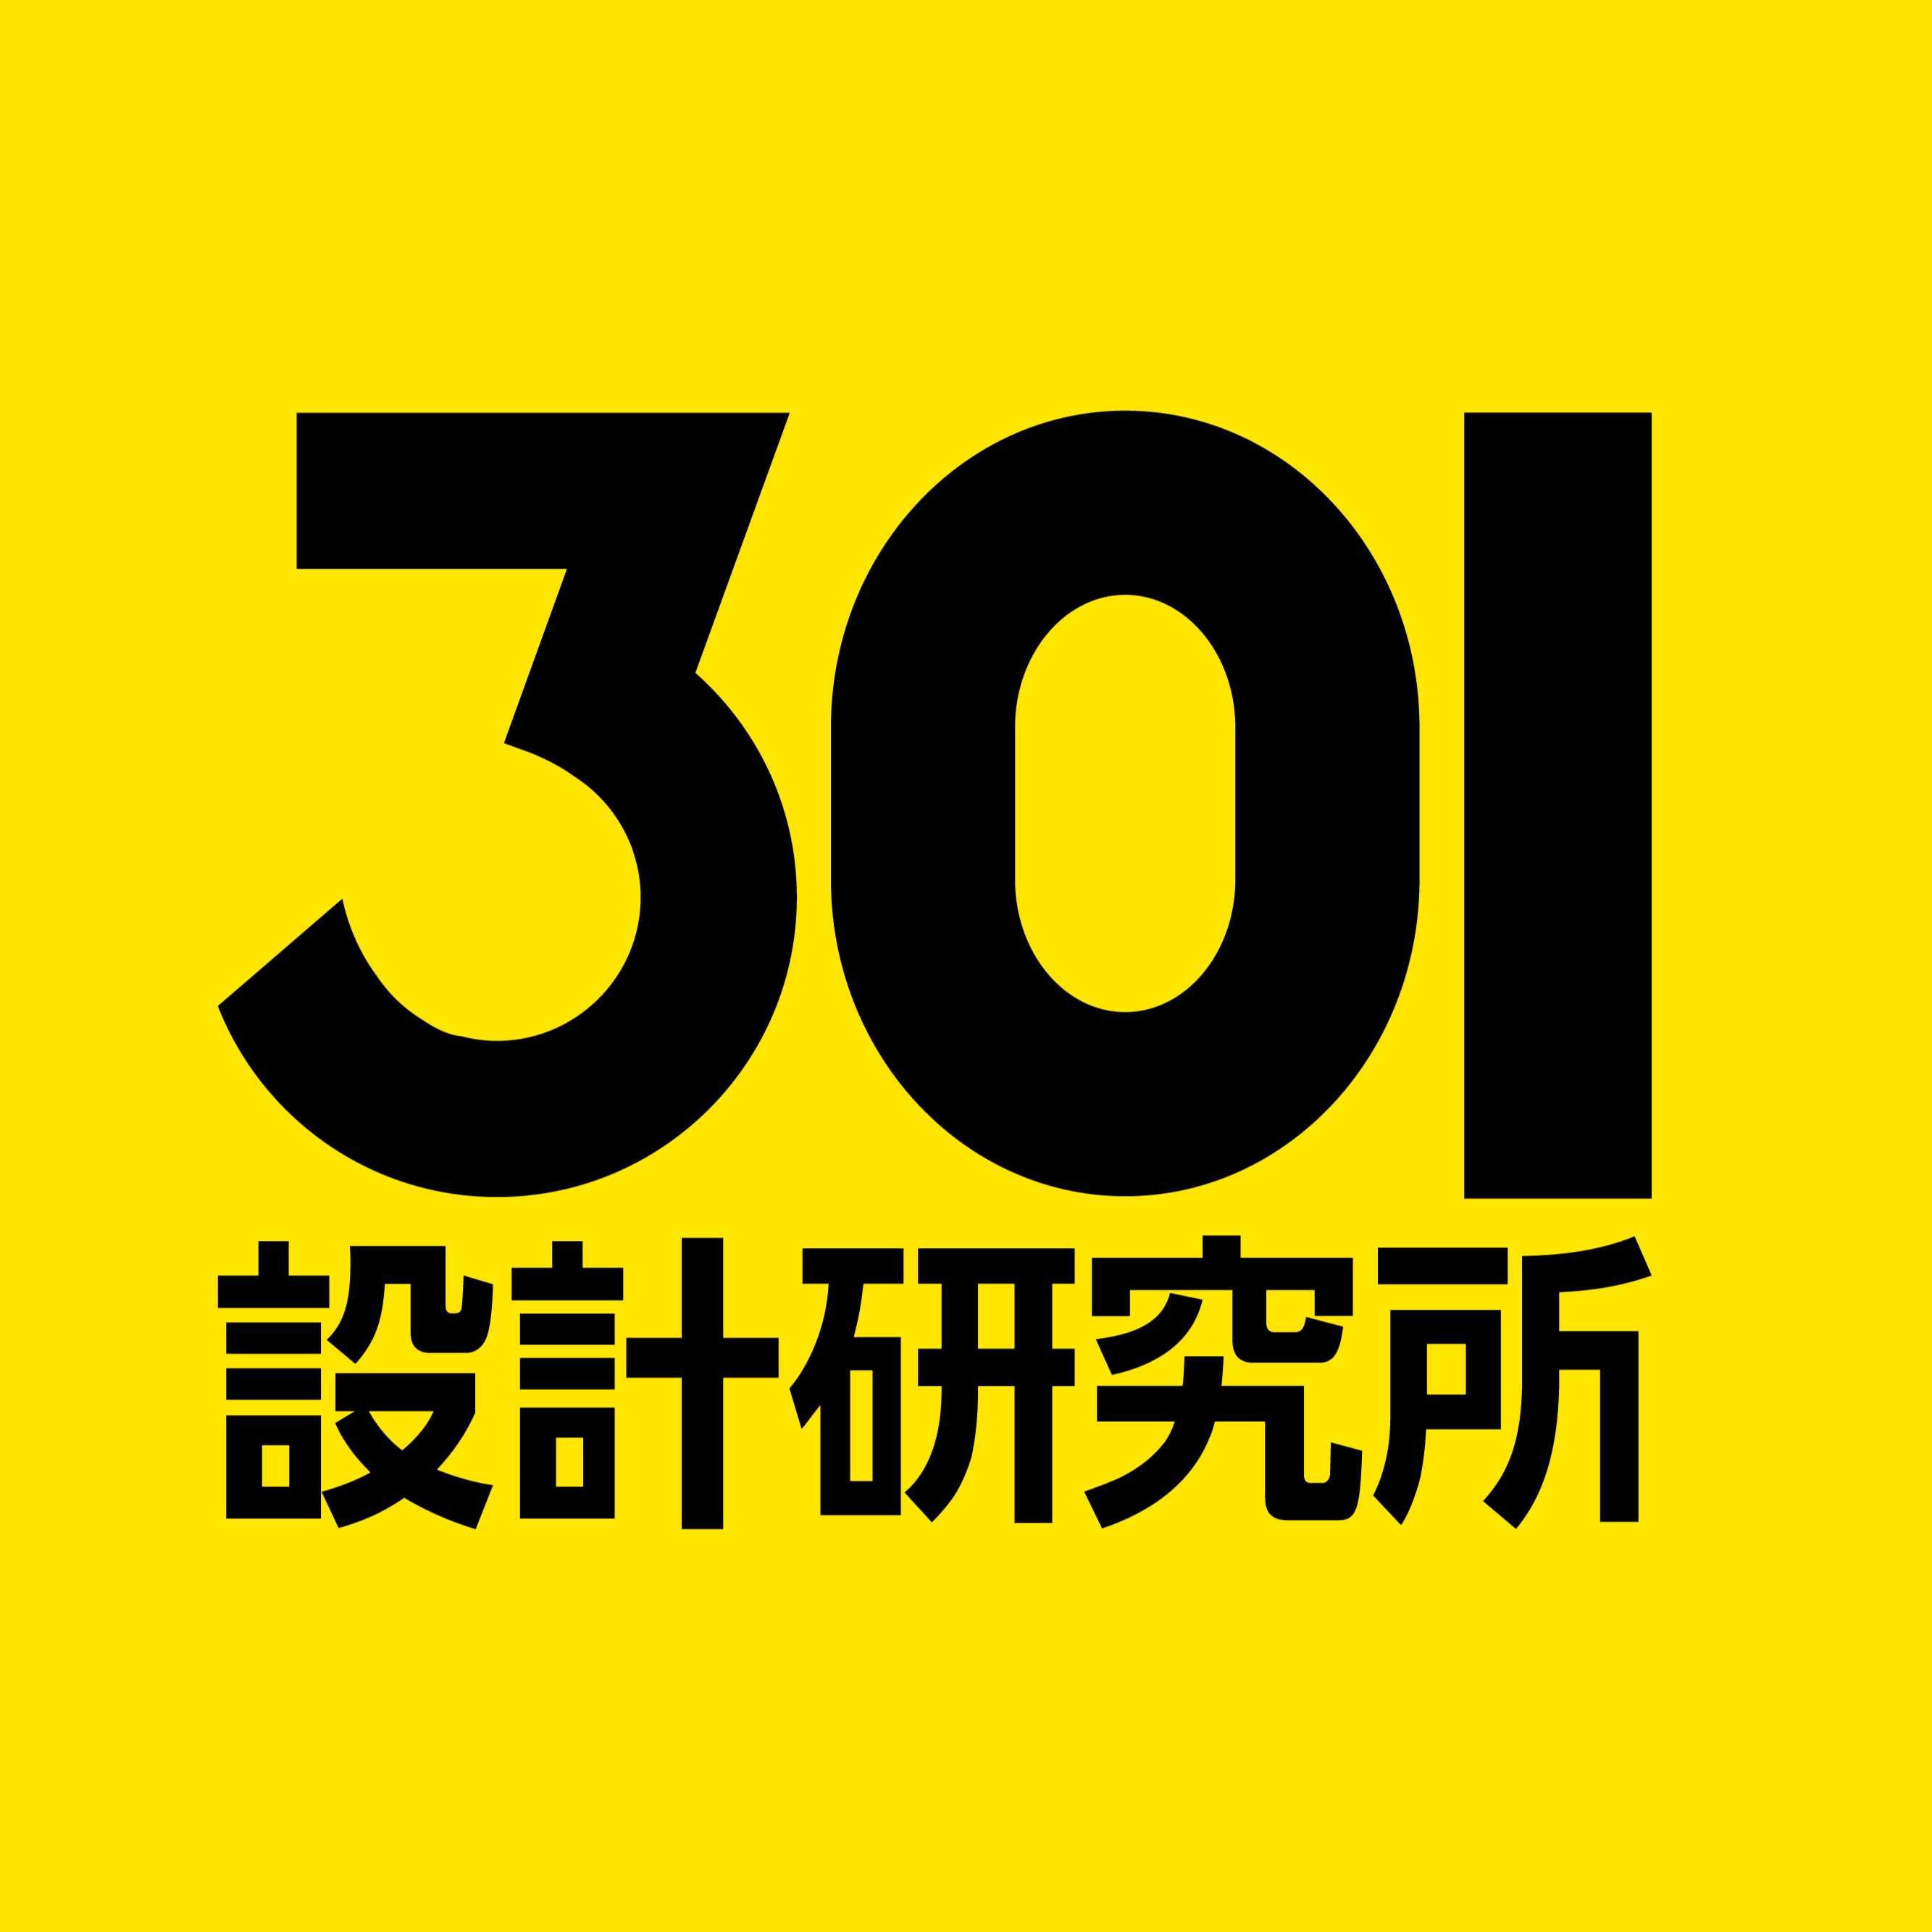 301设计研究所